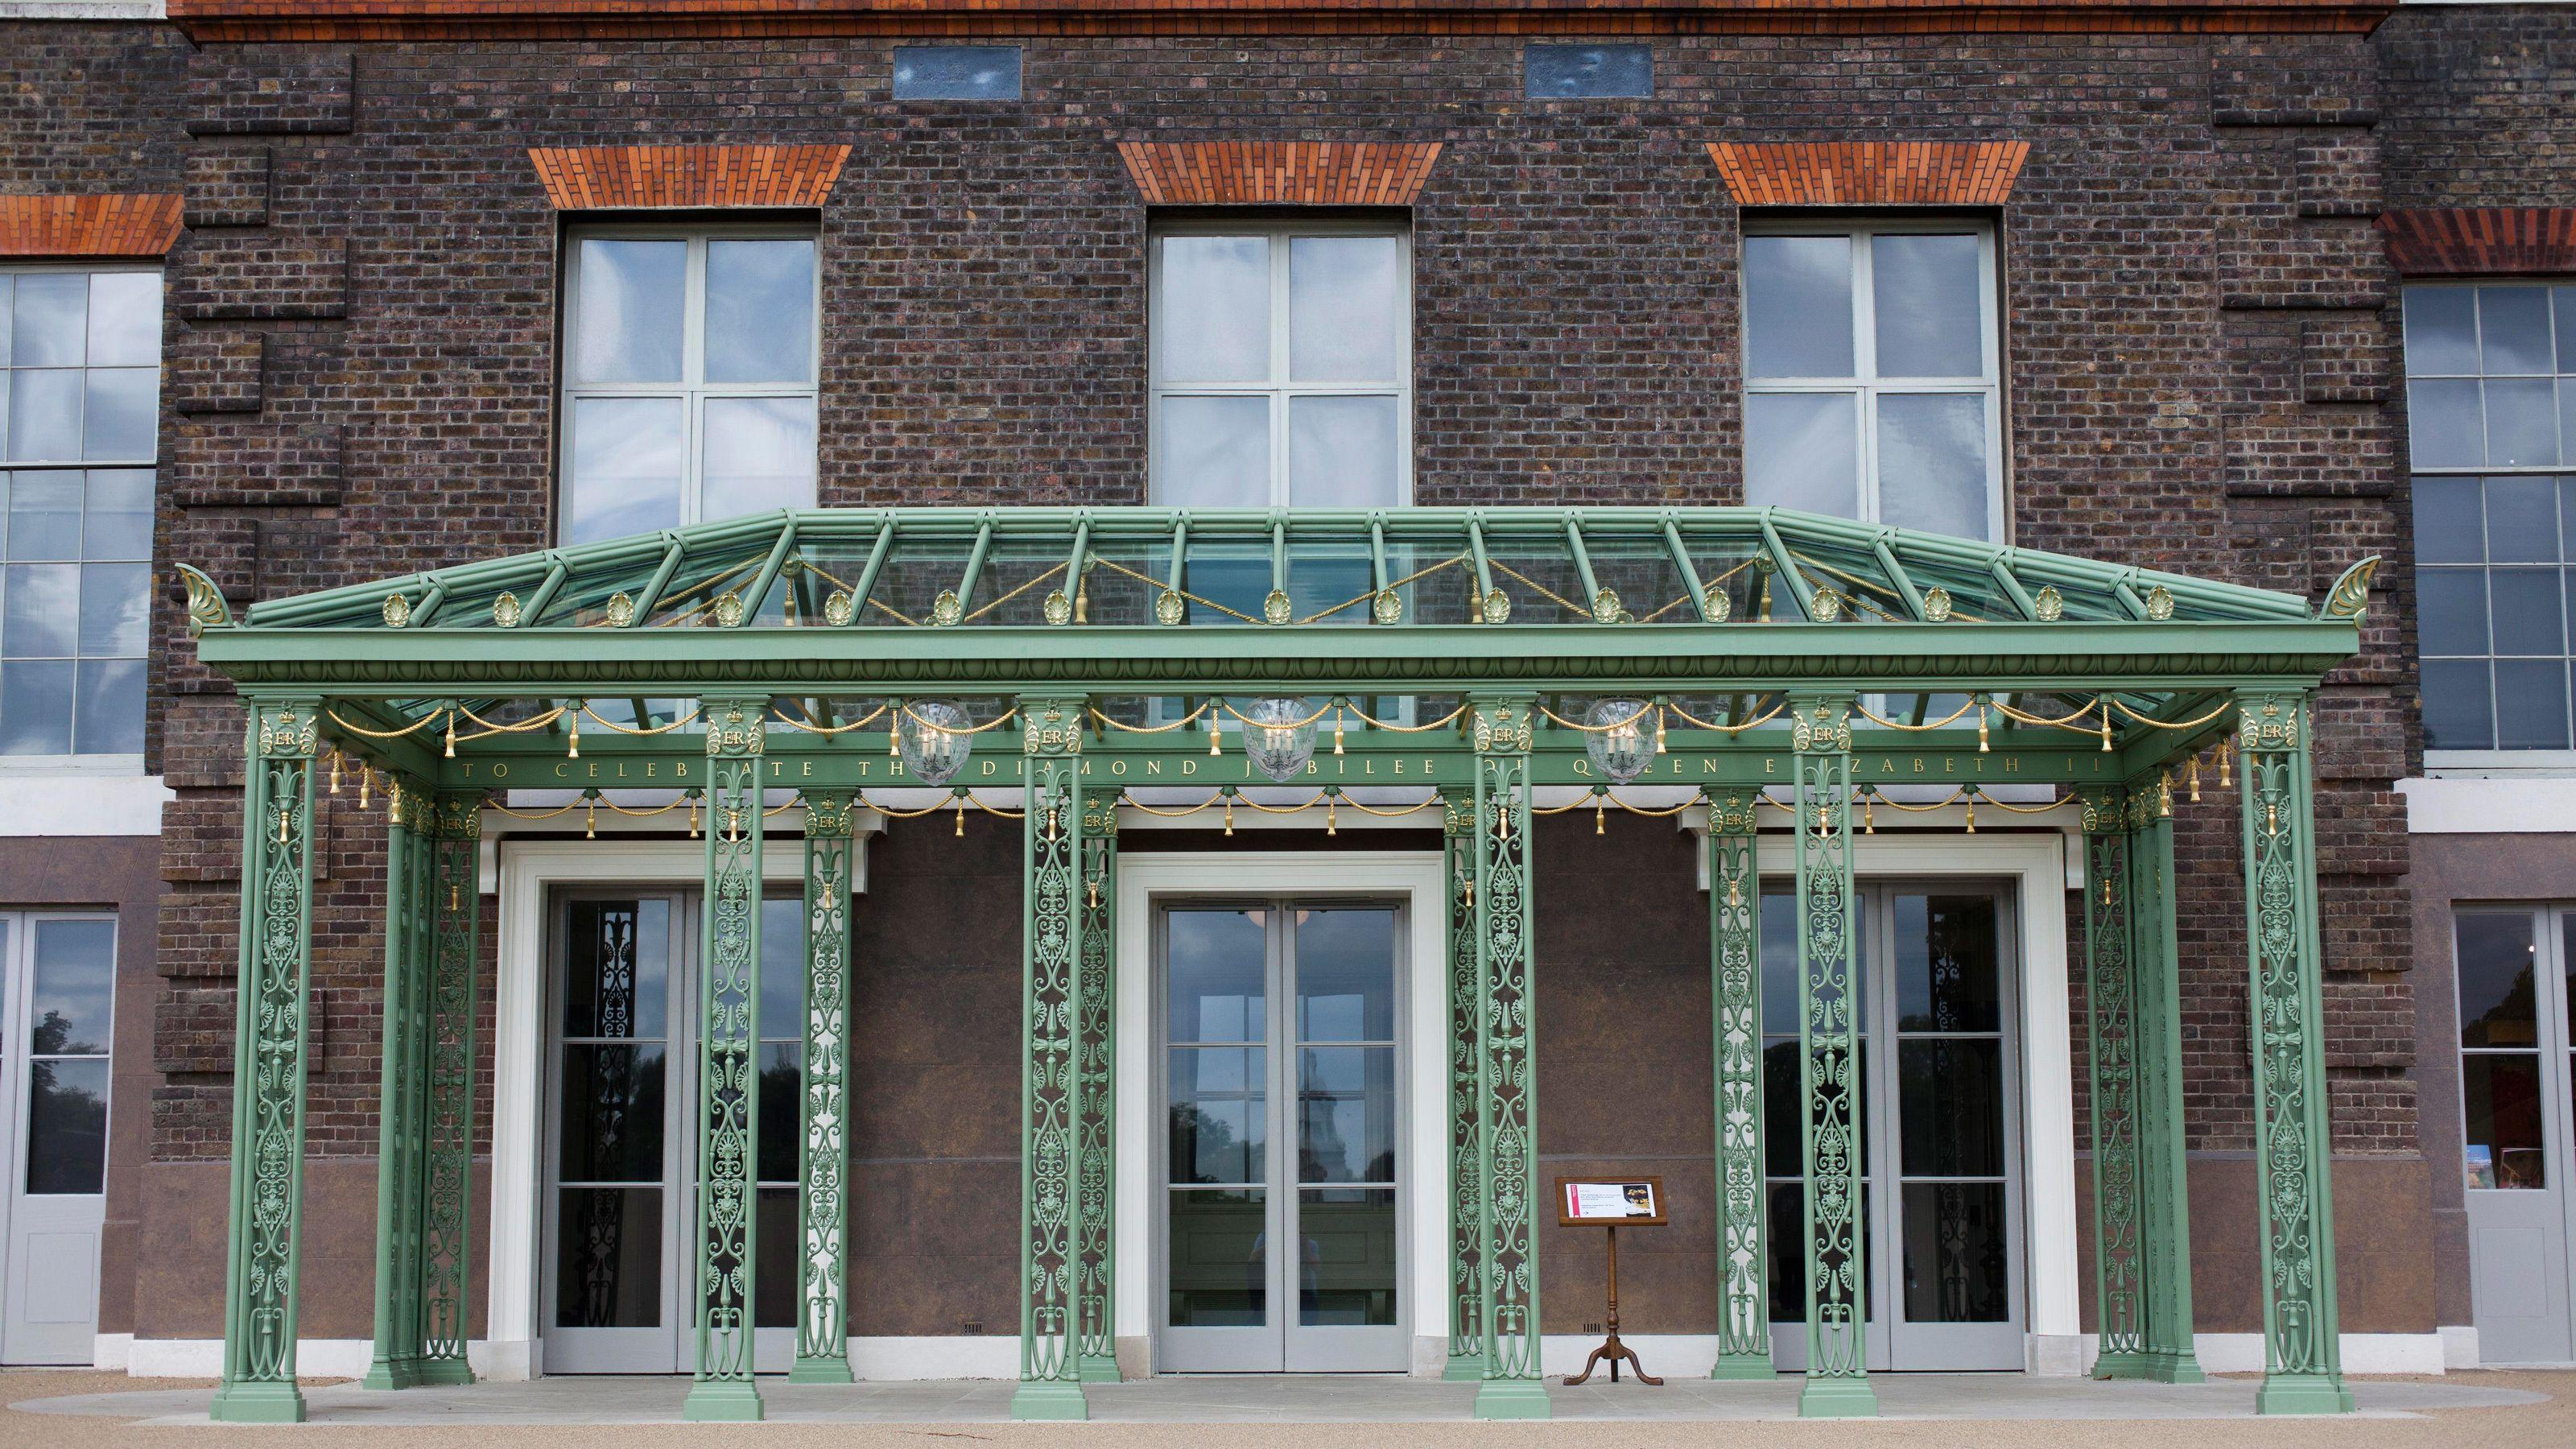 entrance in Kensington Palace in London